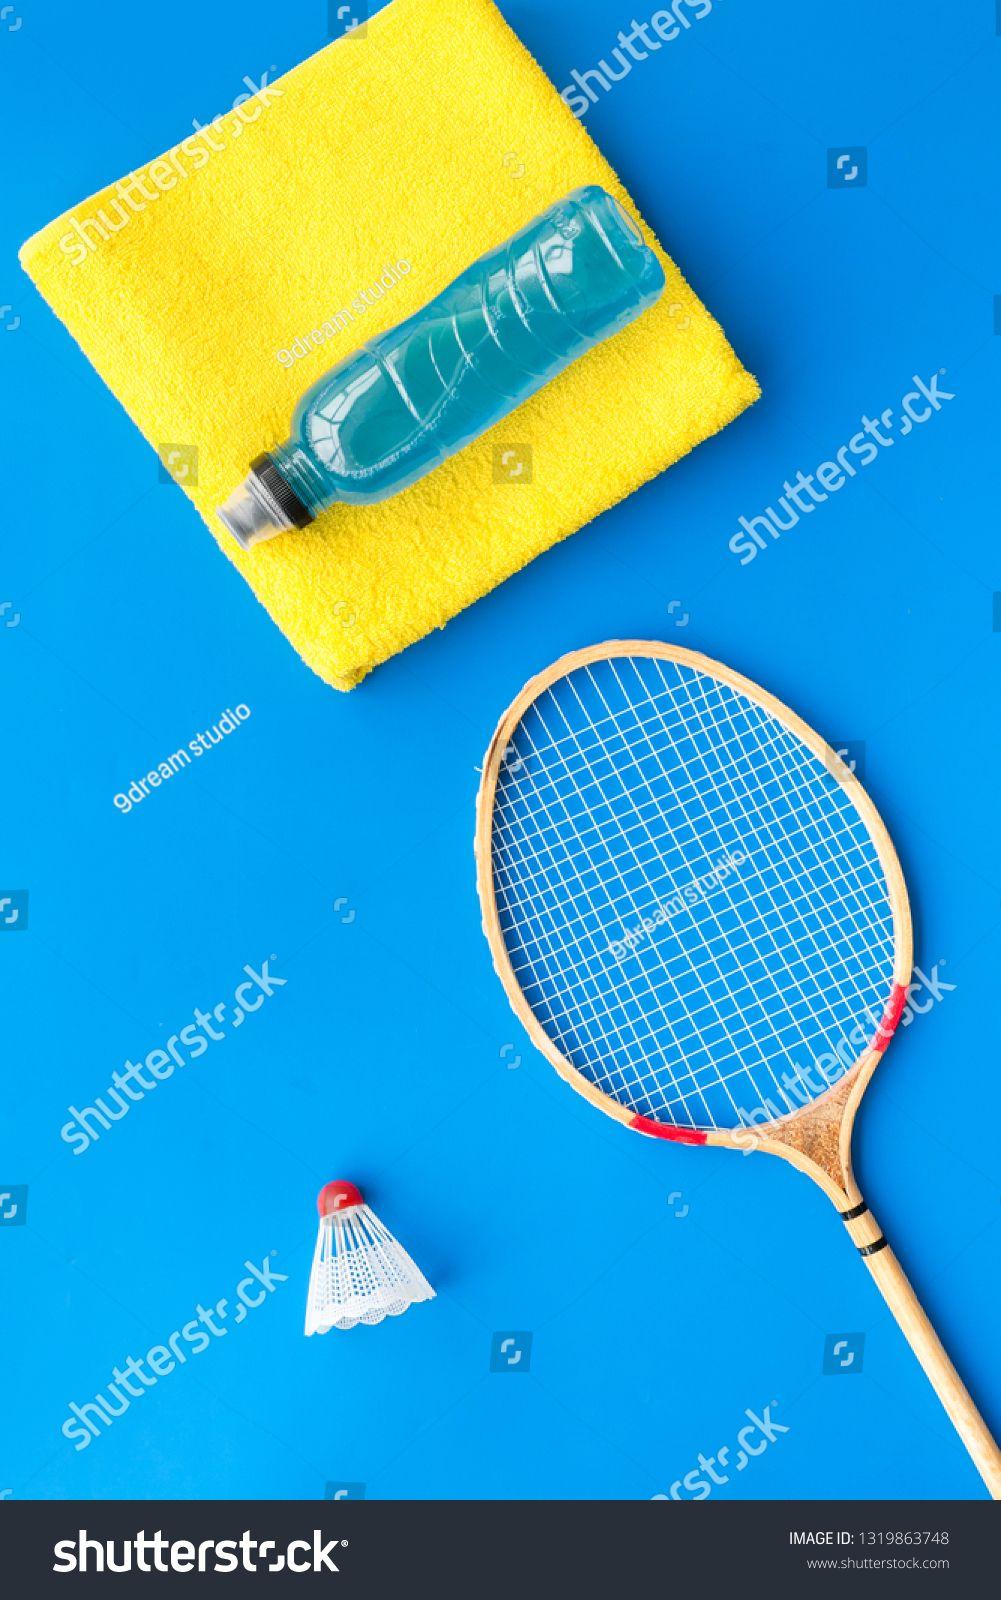 Badminton Training Concept Badminton Racket Shuttlecock Sport Drink And Towel On Blue Background Top View Copy Space Shuttlecocks Badminton Racket Badminton